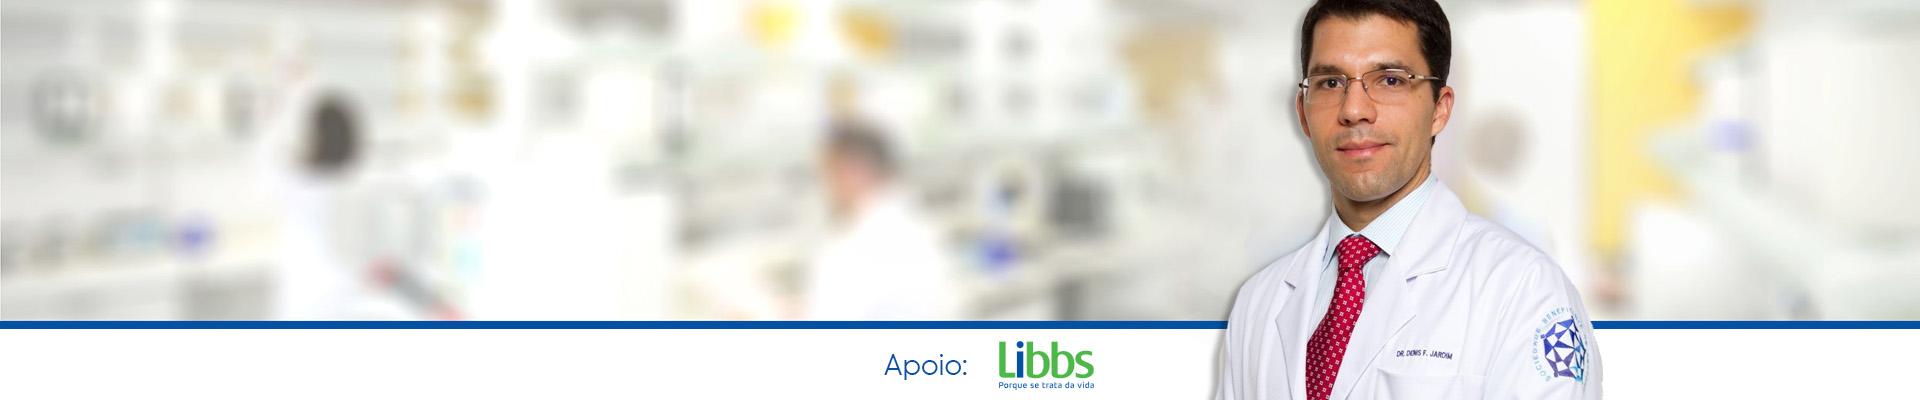 Banner biossimilares